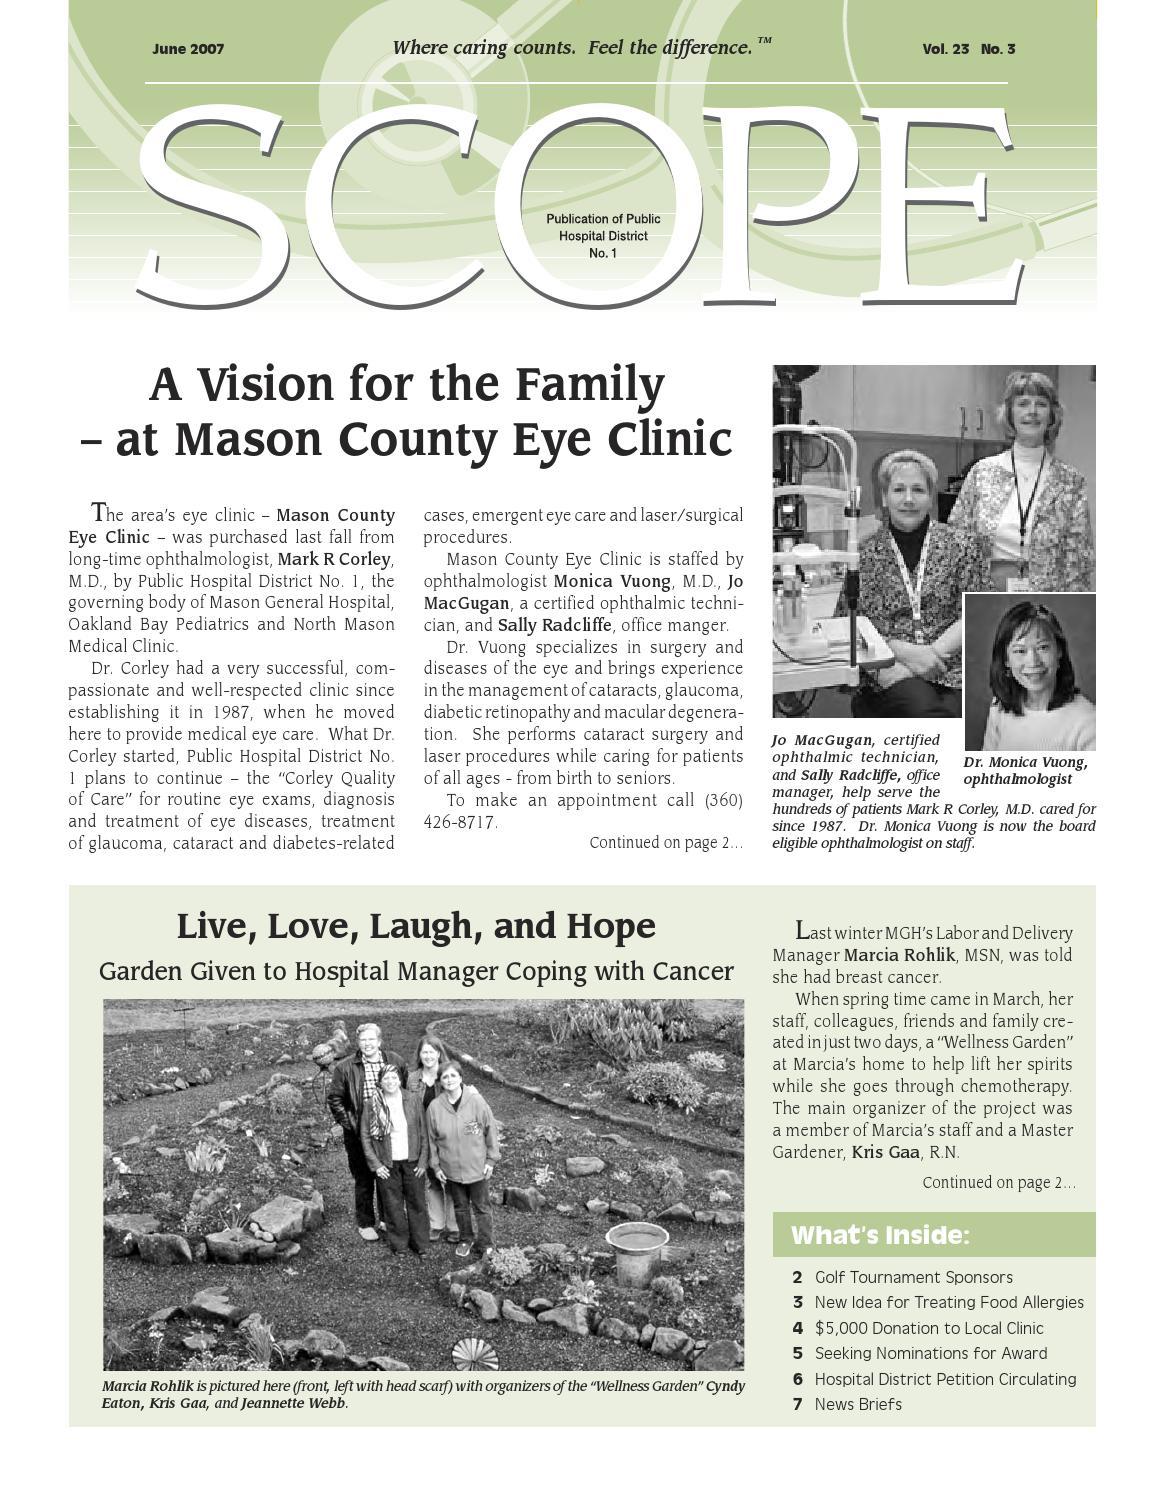 SCOPE Magazine June 2007 by Mason General Hospital & Family